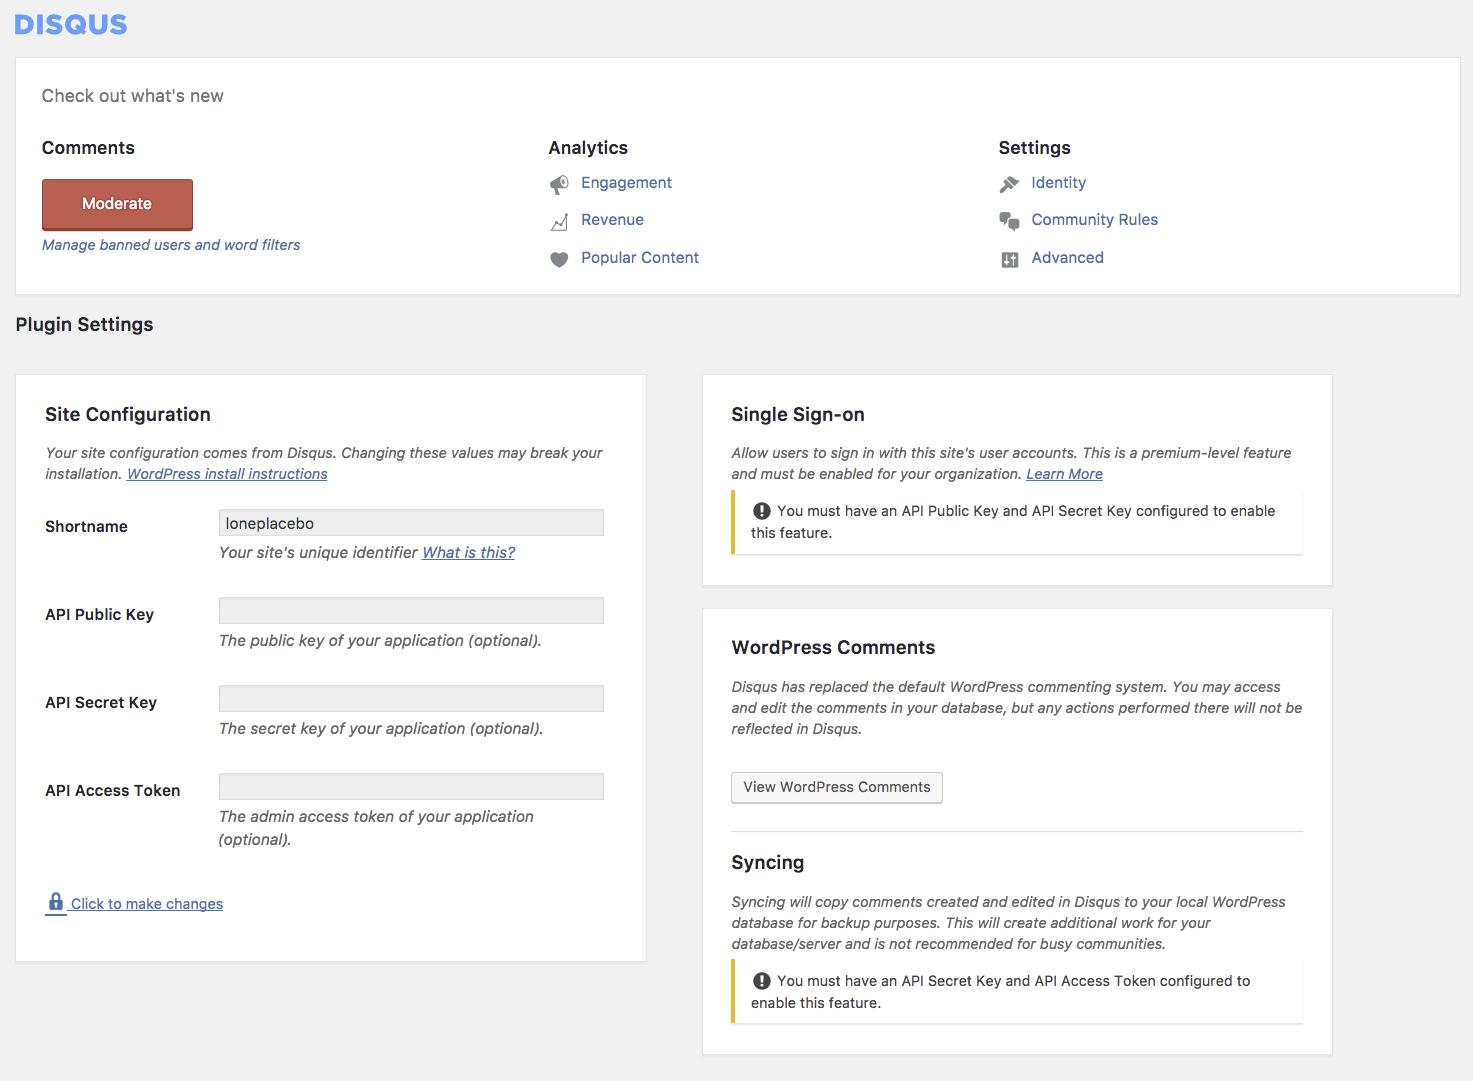 disqus-wordpress=plugin-settings-page.png